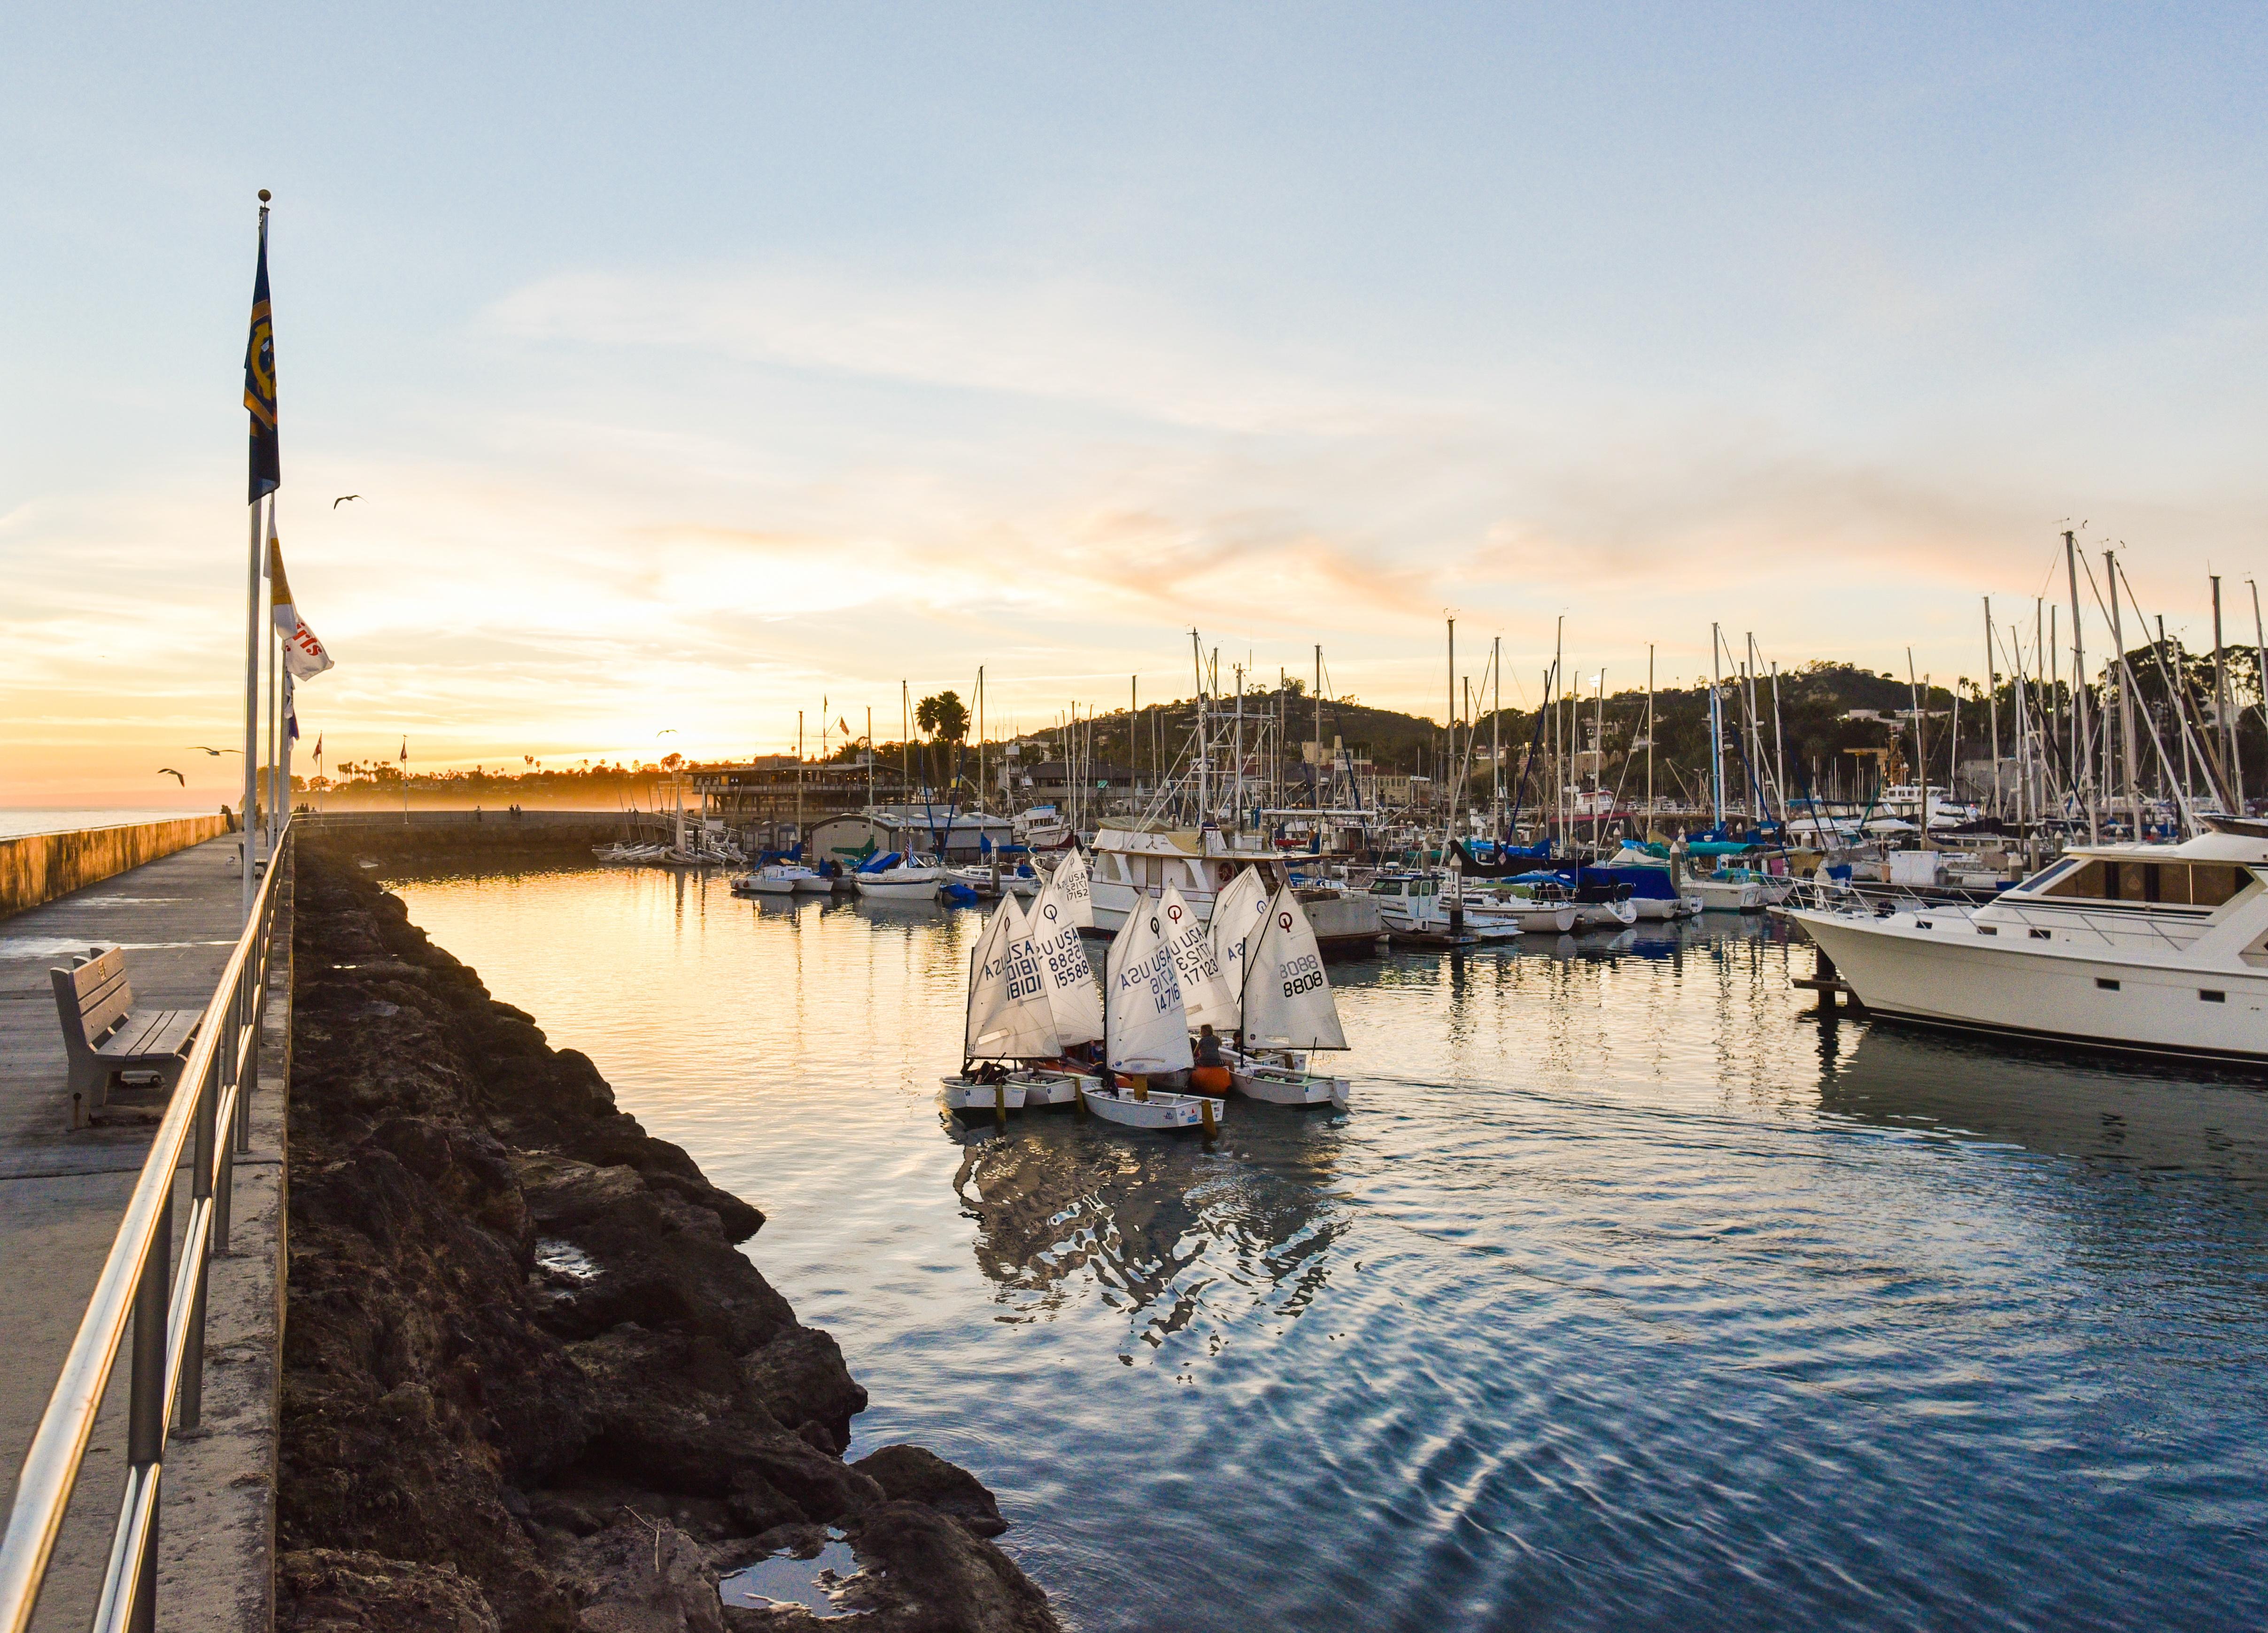 jetty-light-sunset-water.jpg